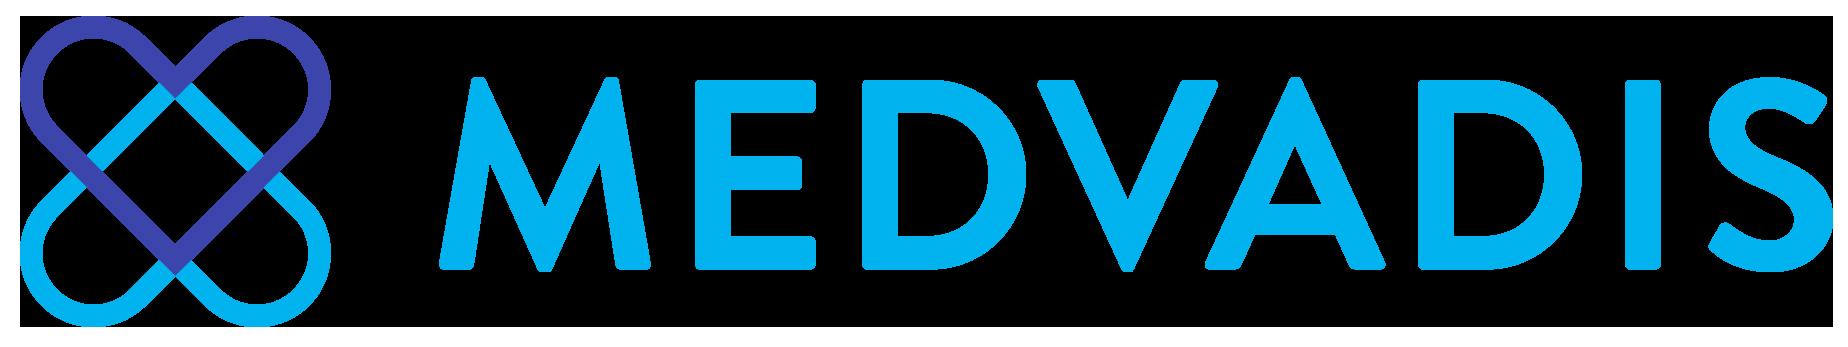 medvadis_logo